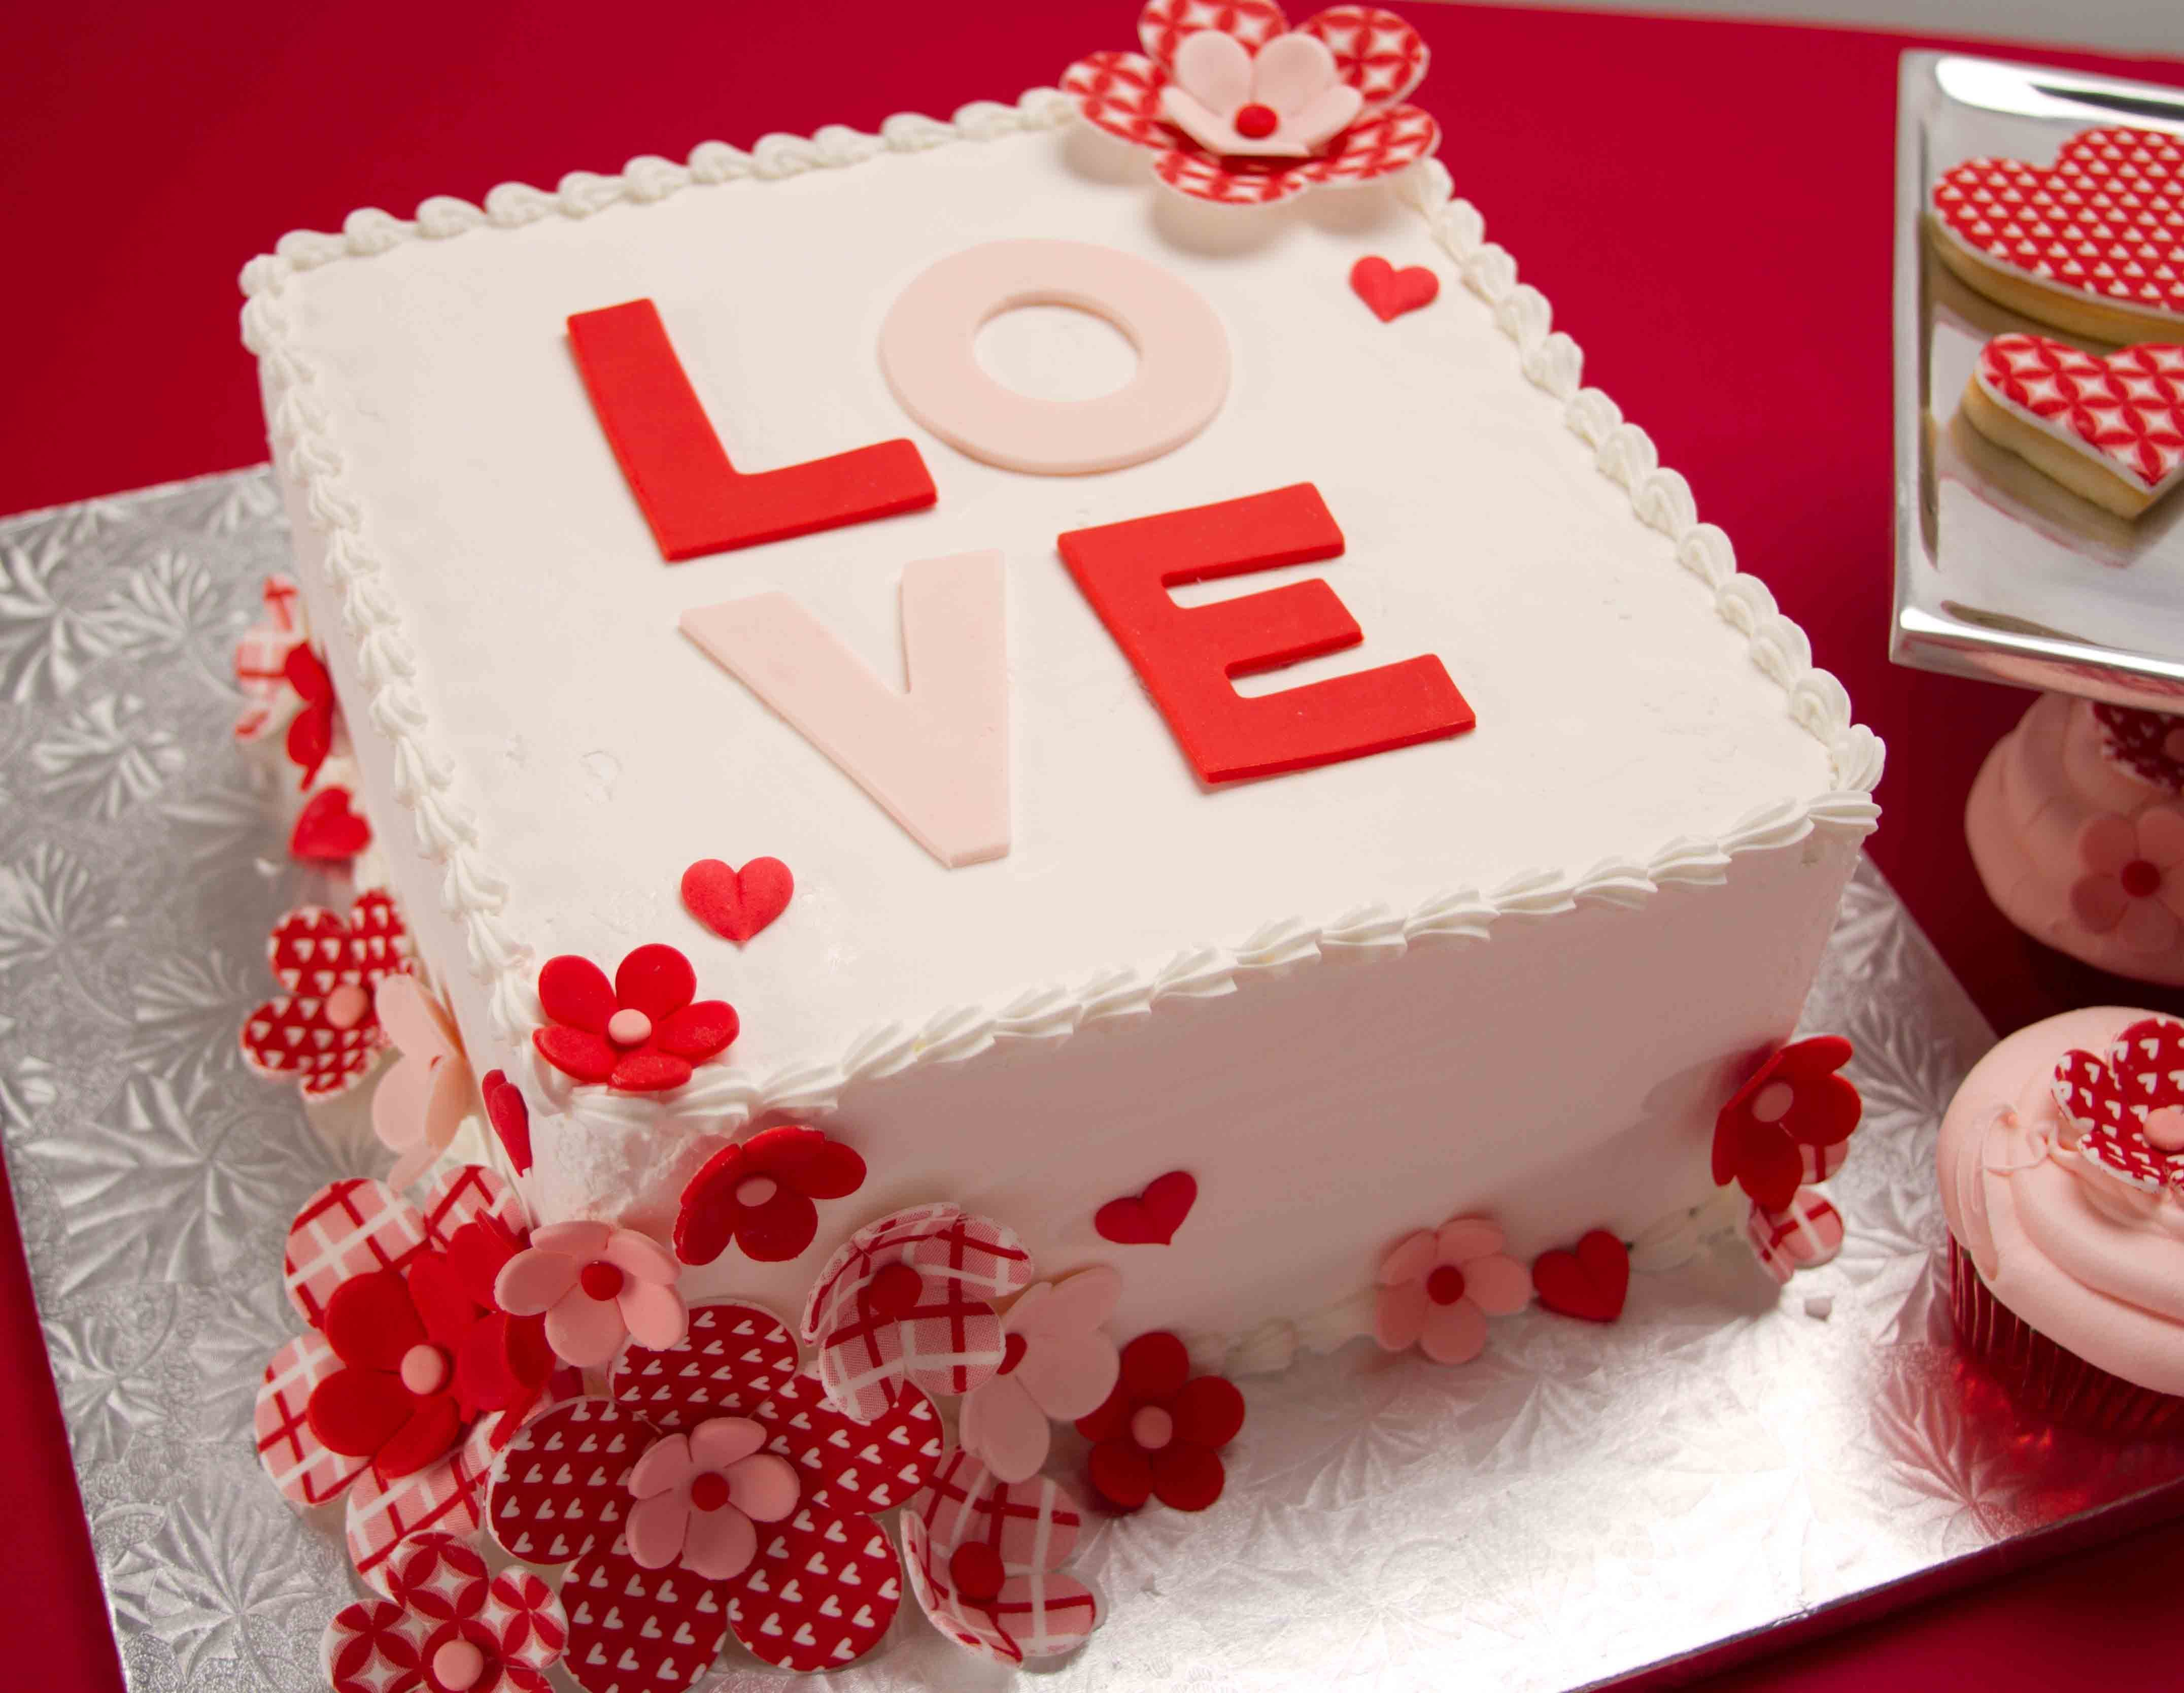 BeautifulBirthdayCakeForHusband, Wife, Valentine's Day